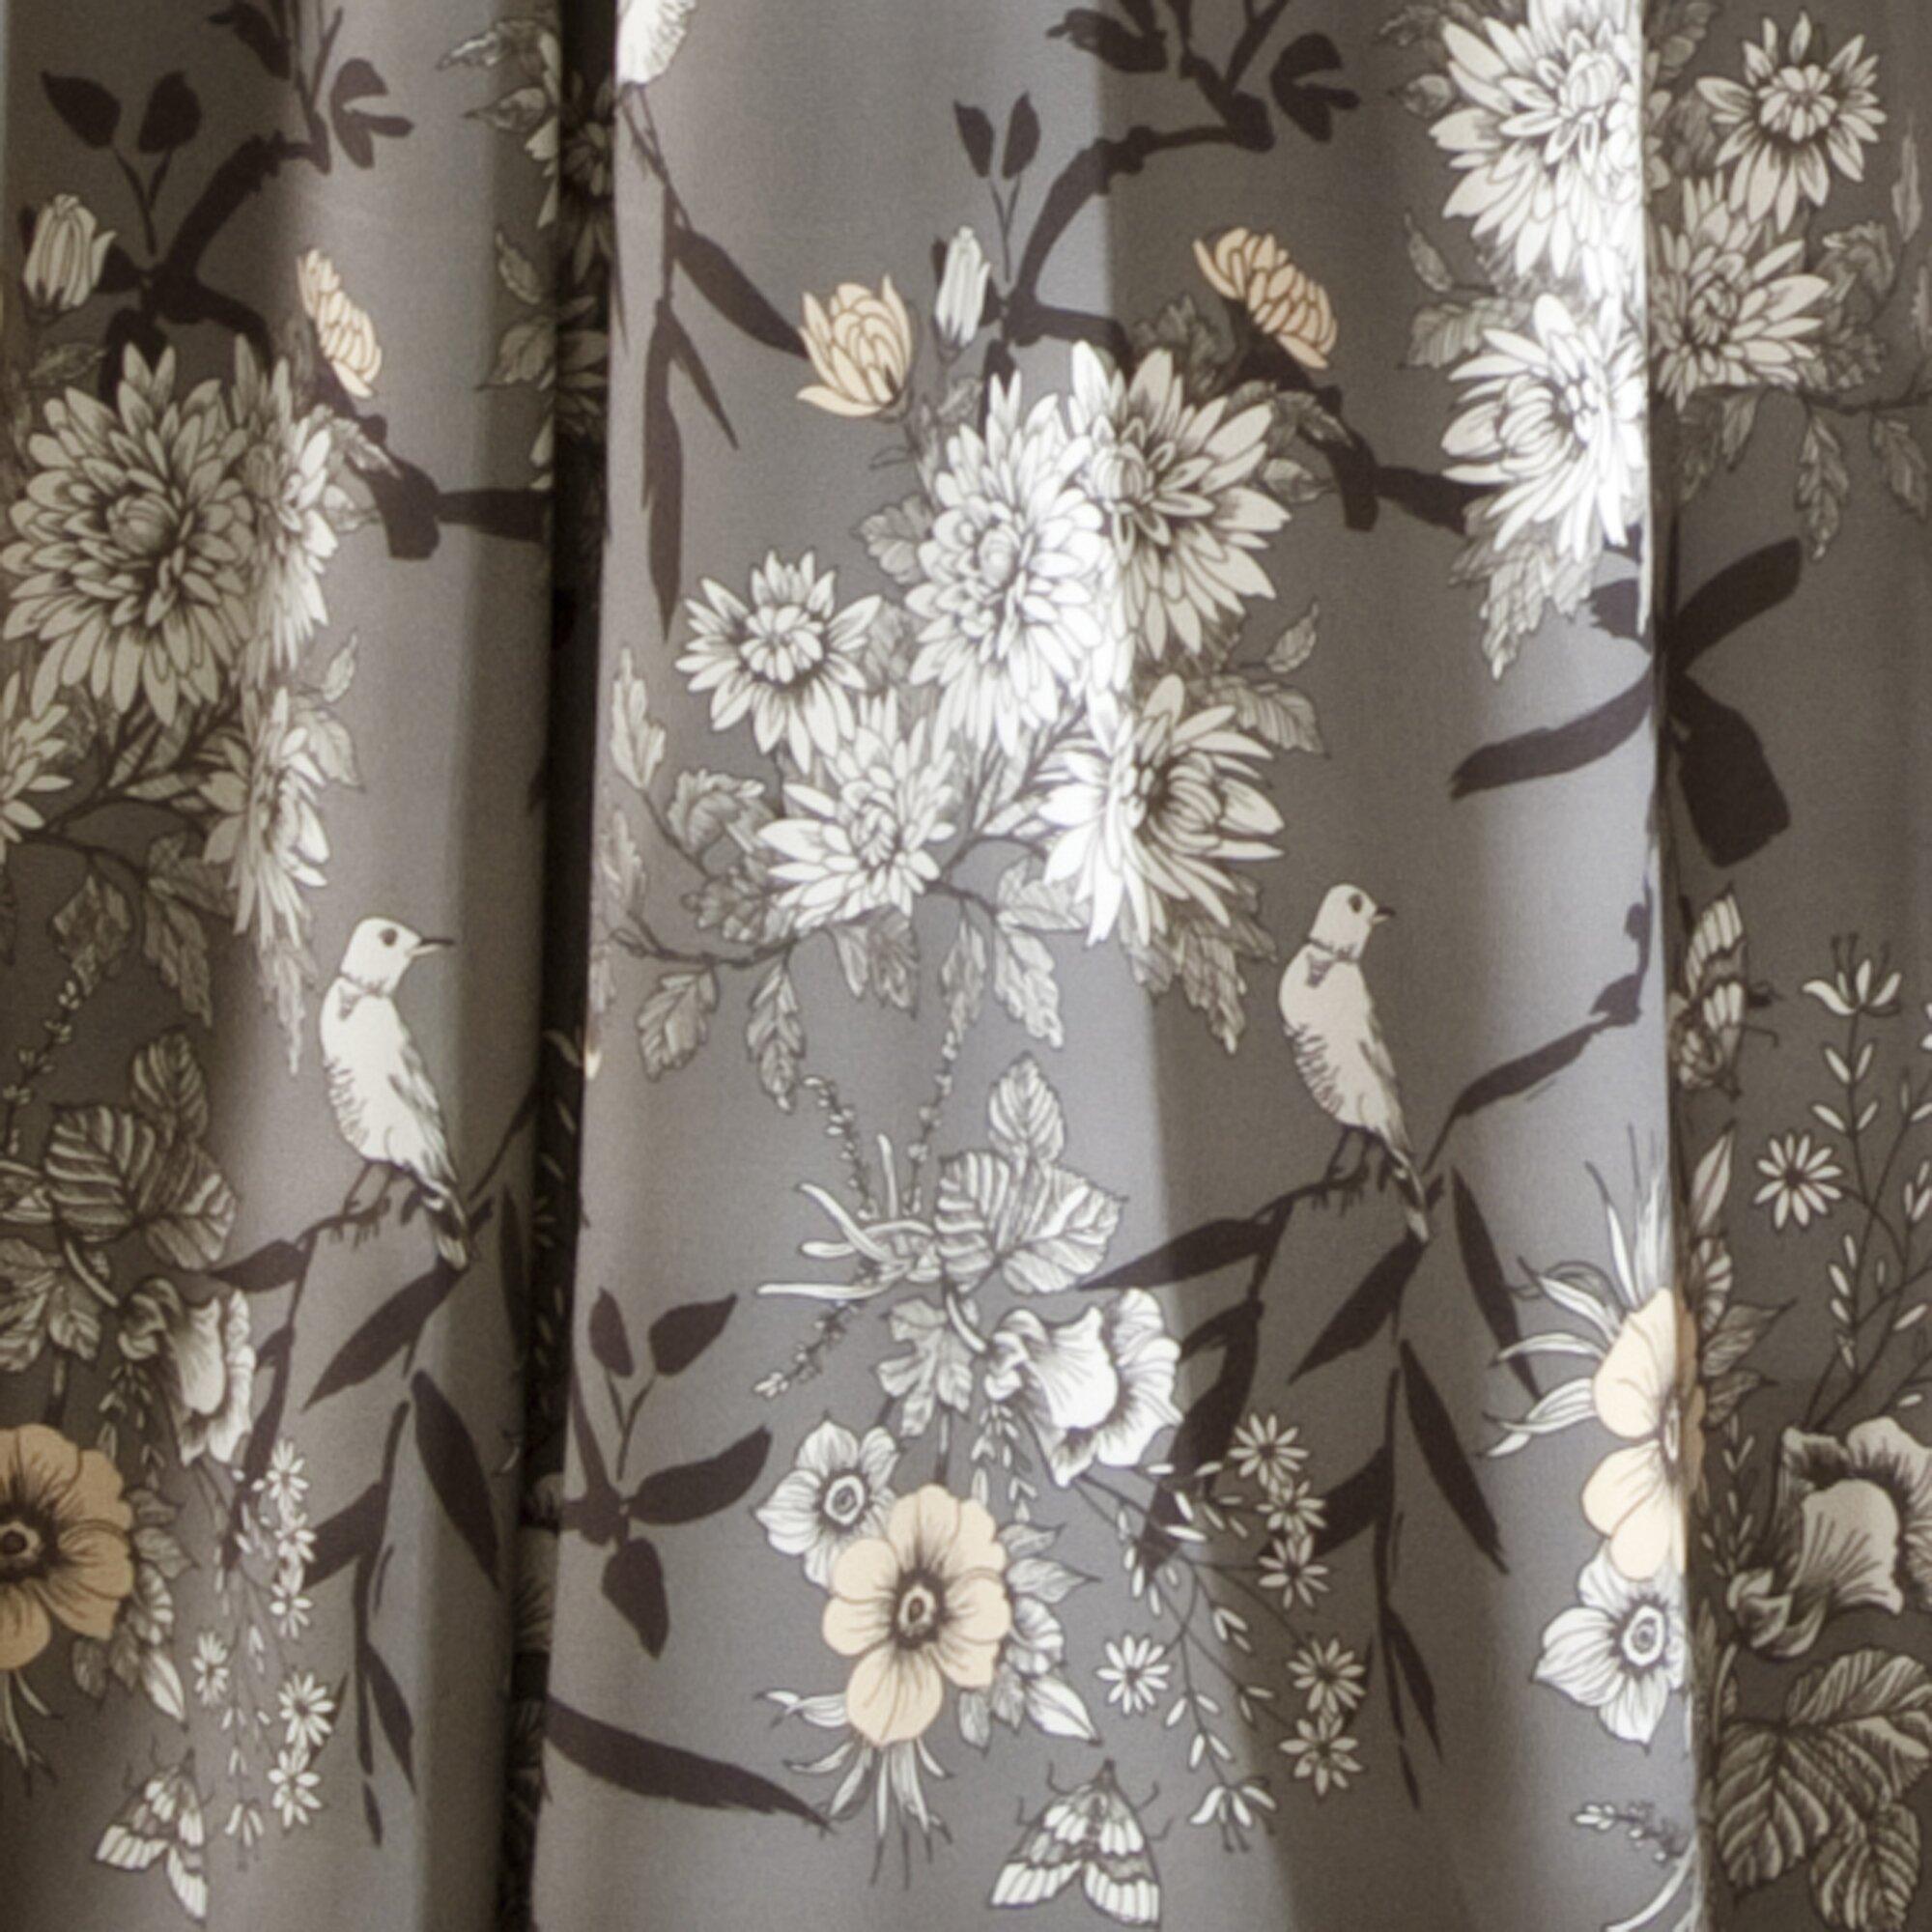 Lush Decor Botanical Garden Curtain Panel & Reviews